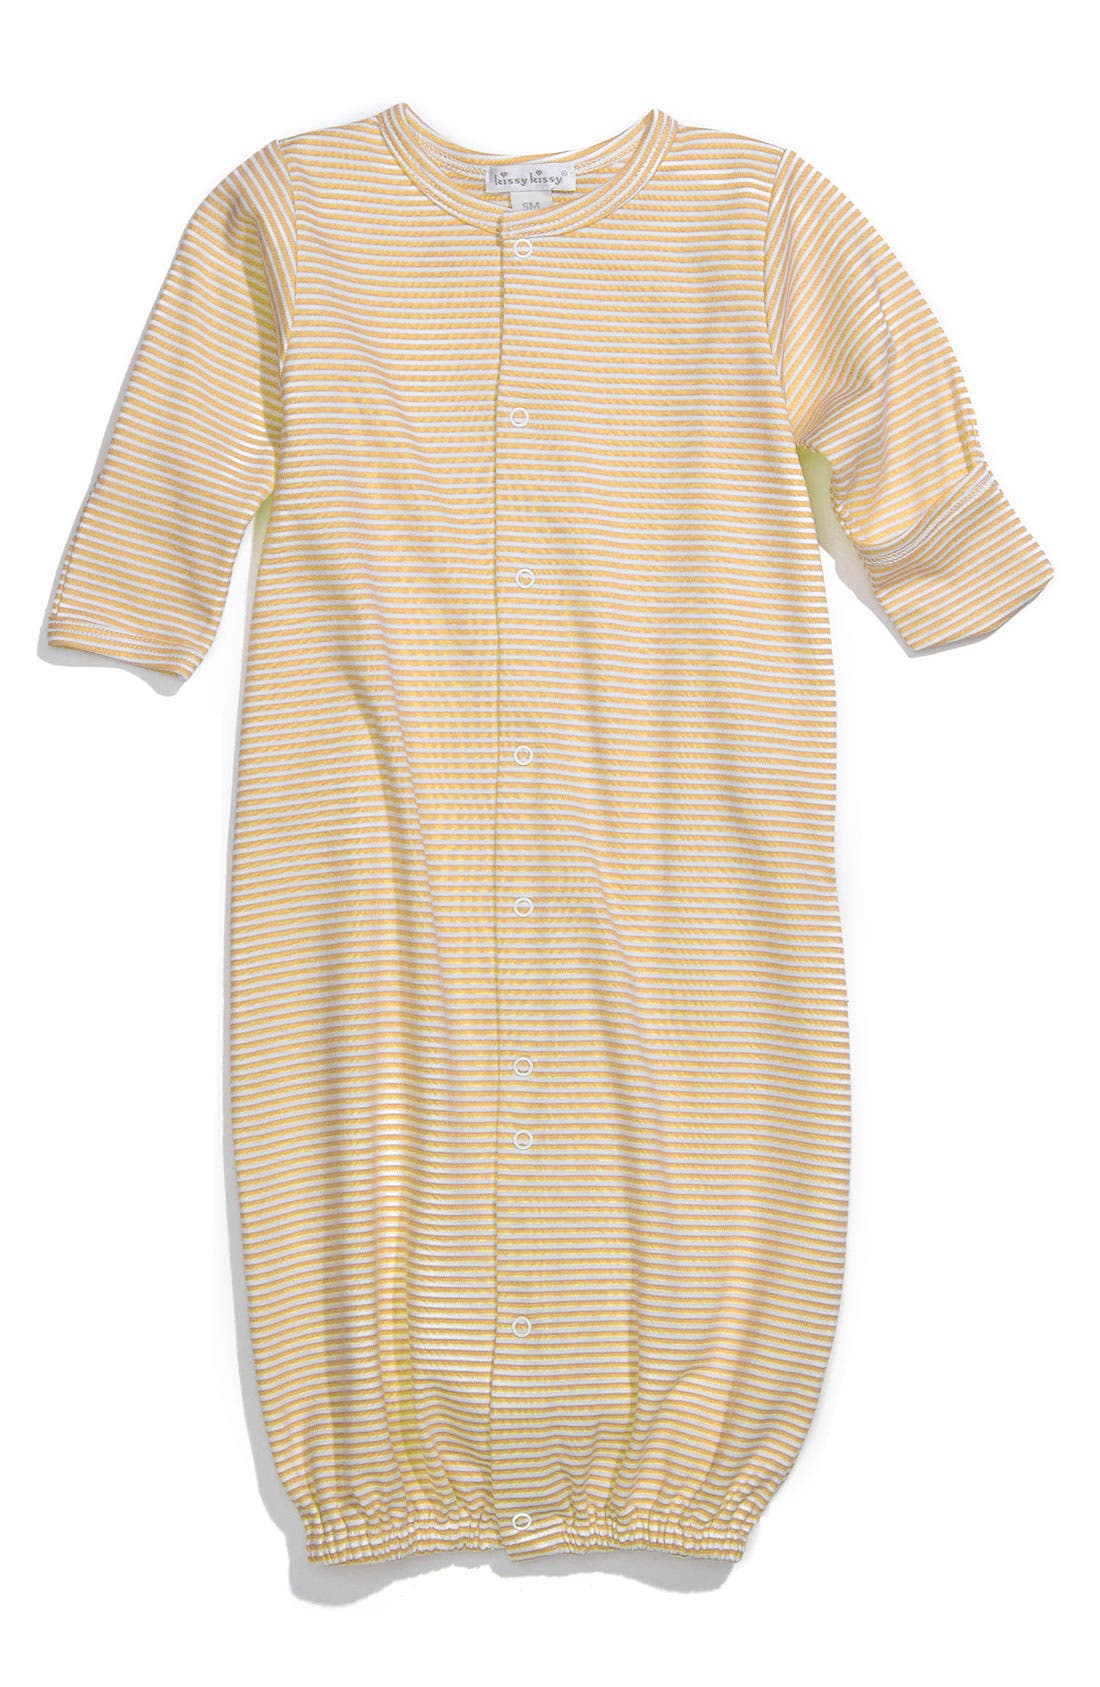 Alternate Image 1 Selected - Kissy Kissy Stripe Gown (Infant)